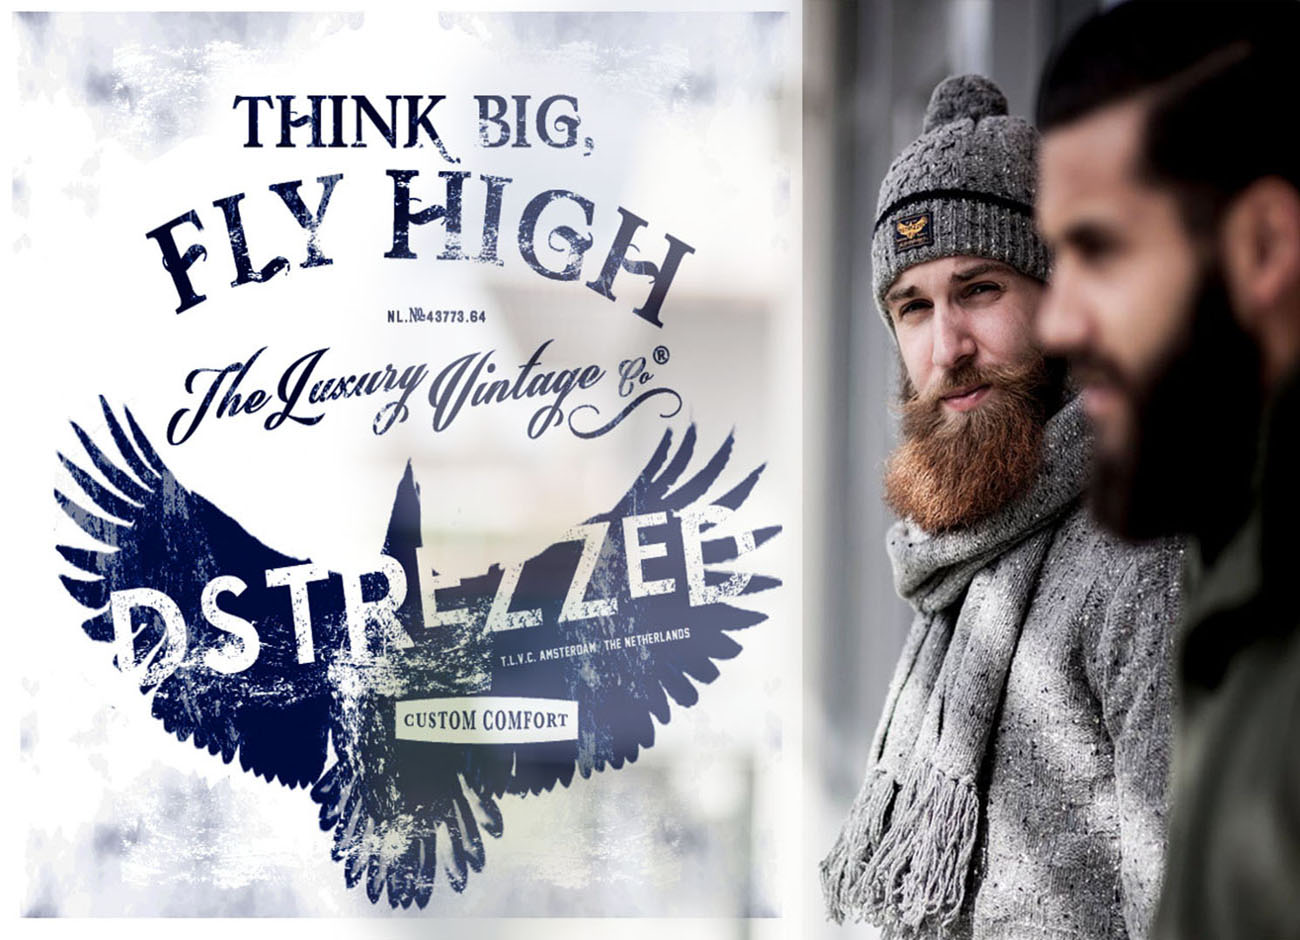 DZZ.think-big.ill_